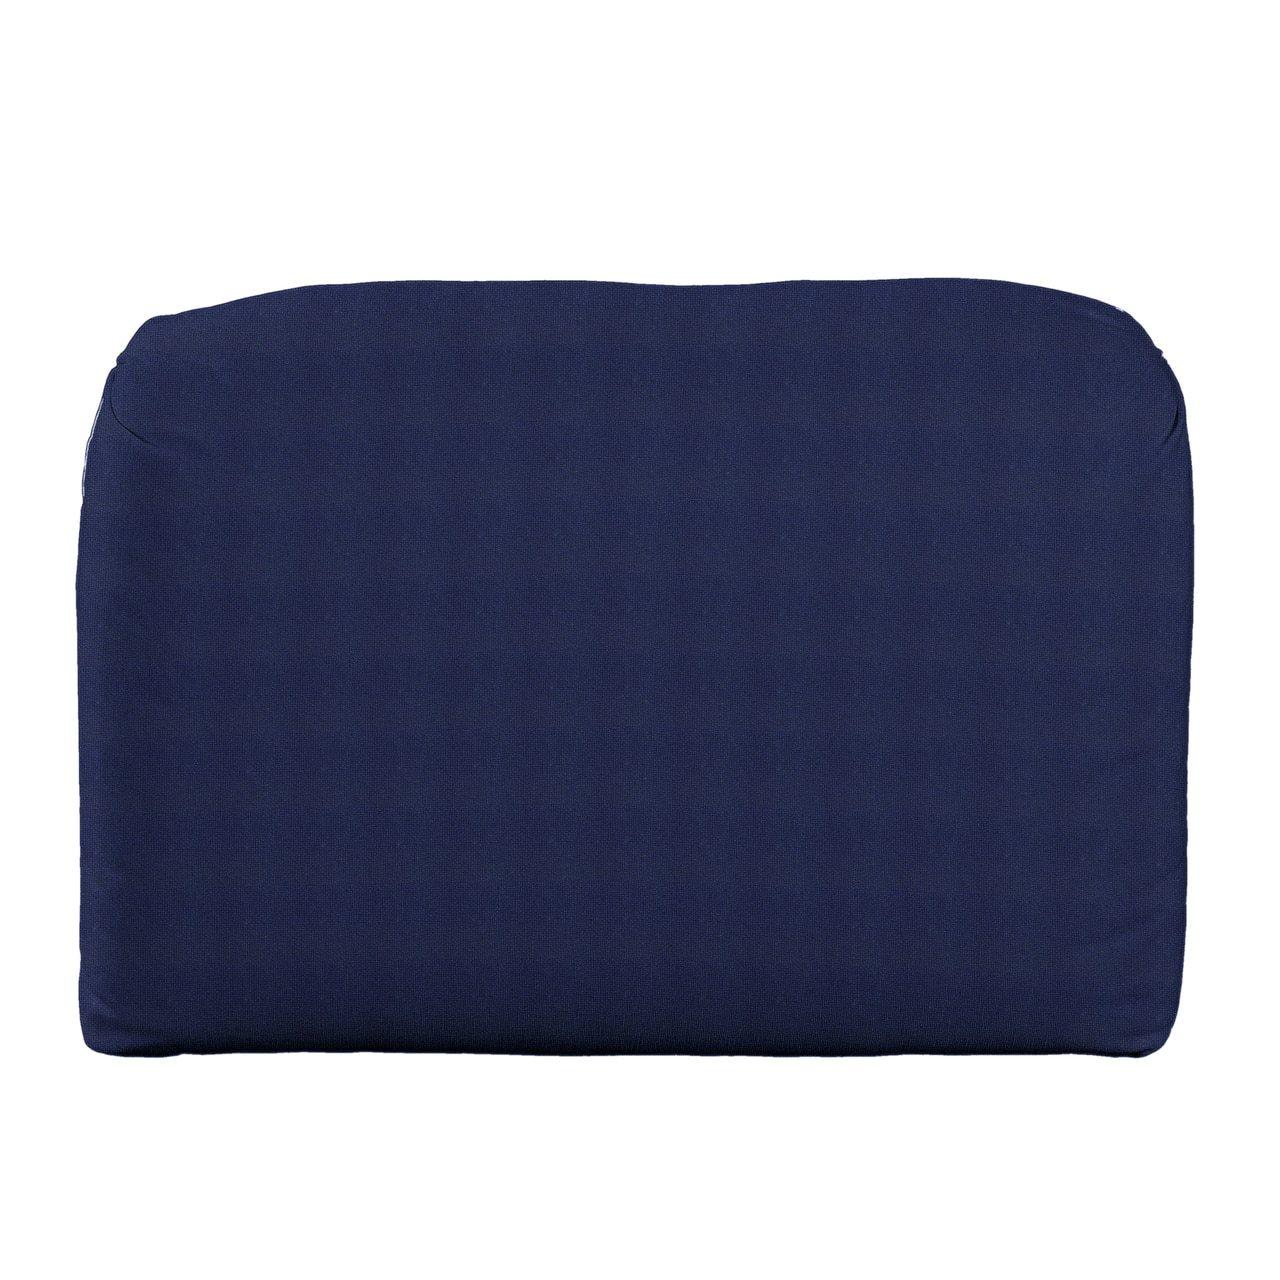 Overstuffed Back Cushion